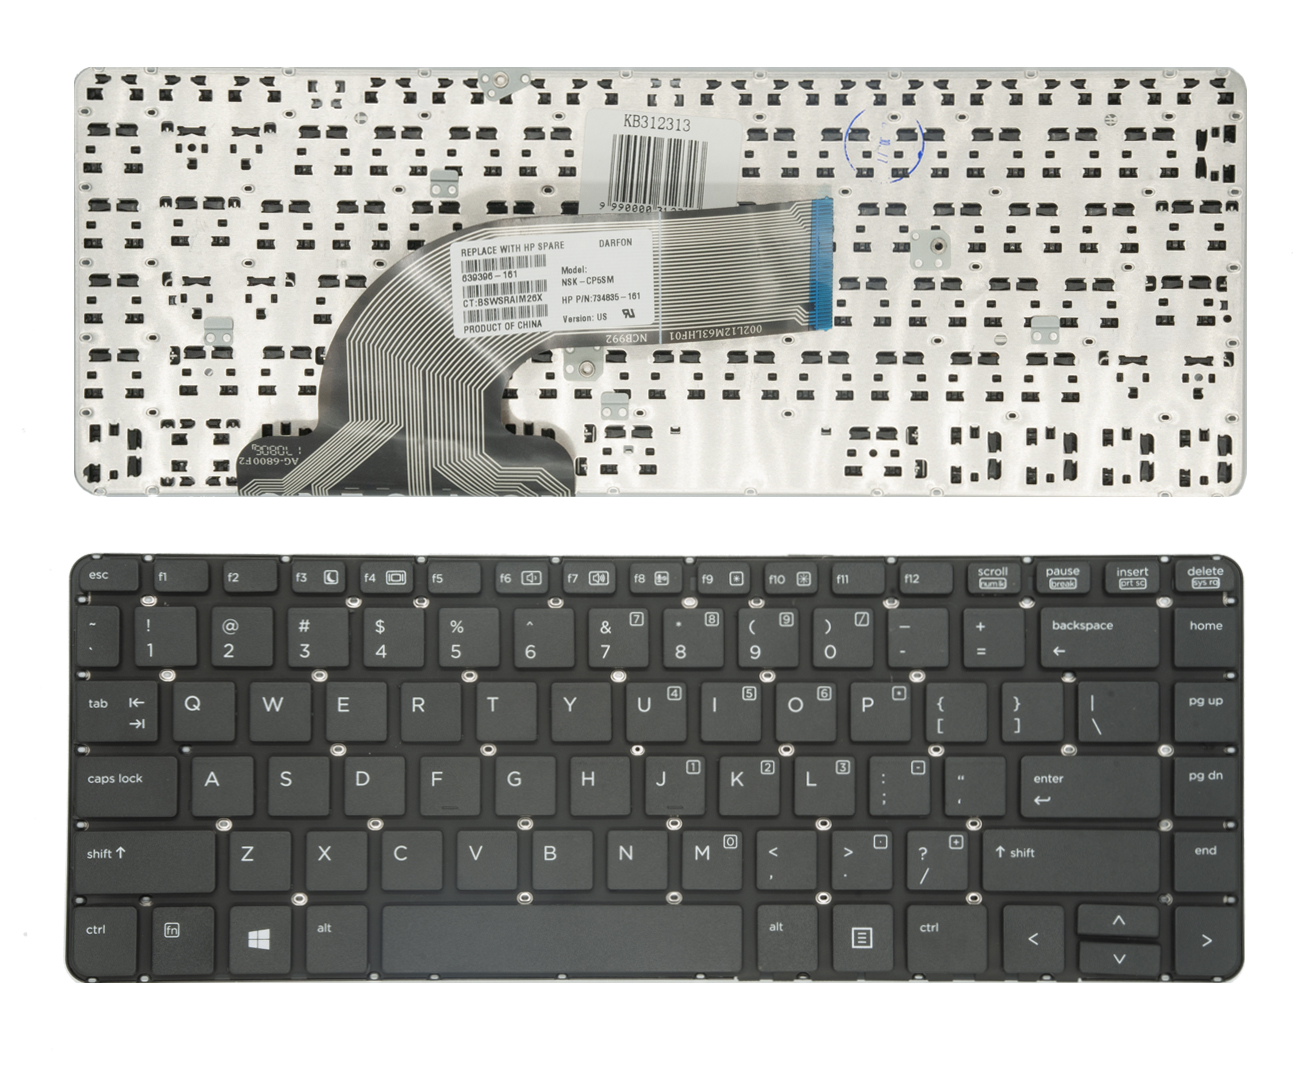 Klaviatūra HP ProBook 430 G2, 440 G0, 440 G1, 440 G2, 445 G2, 630 G2, 640 G1, 645 G1